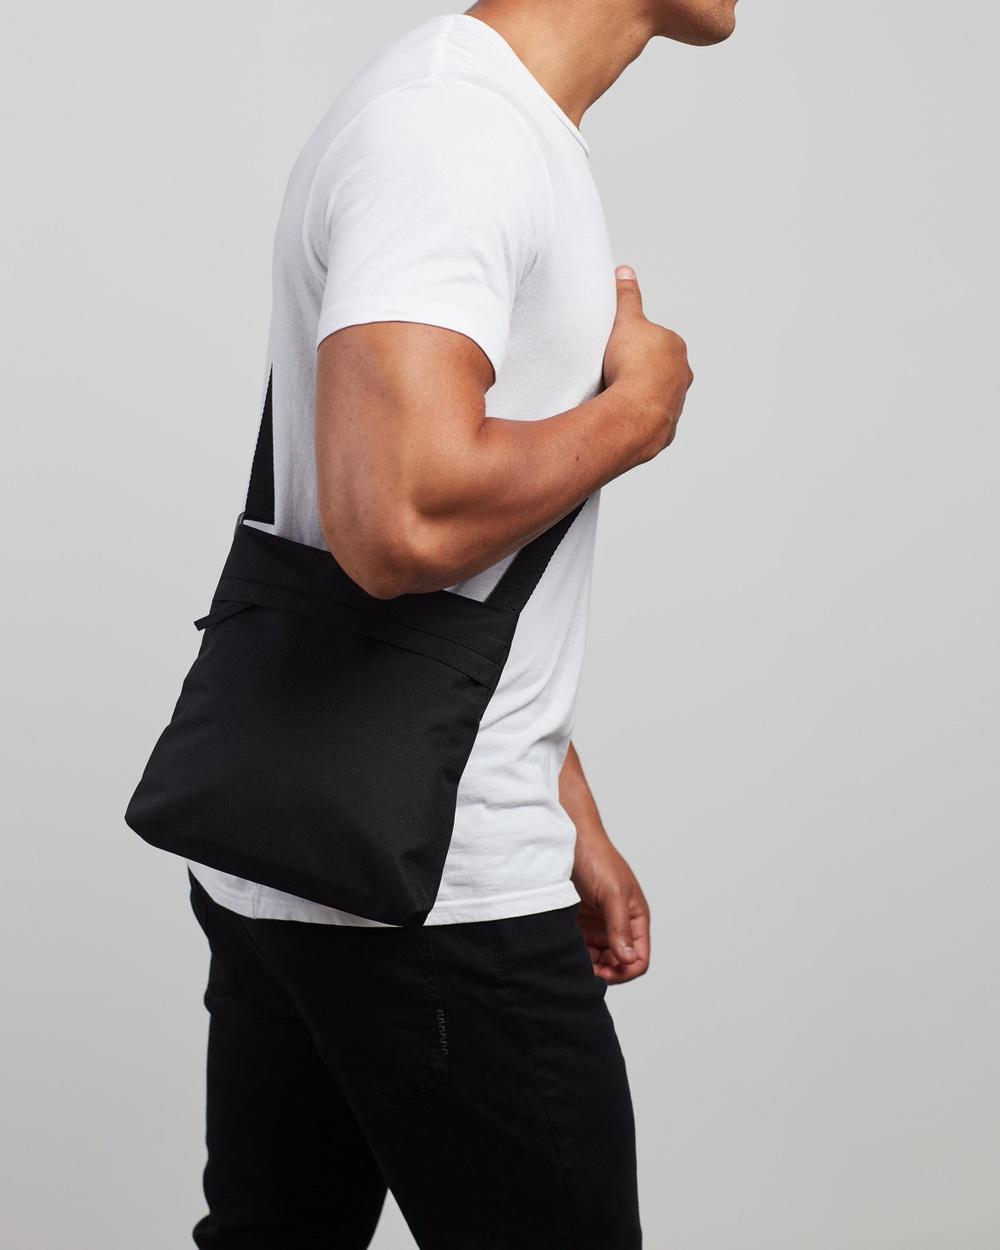 AERE Recycled Cross Body Bag Handbags Black Cross-Body